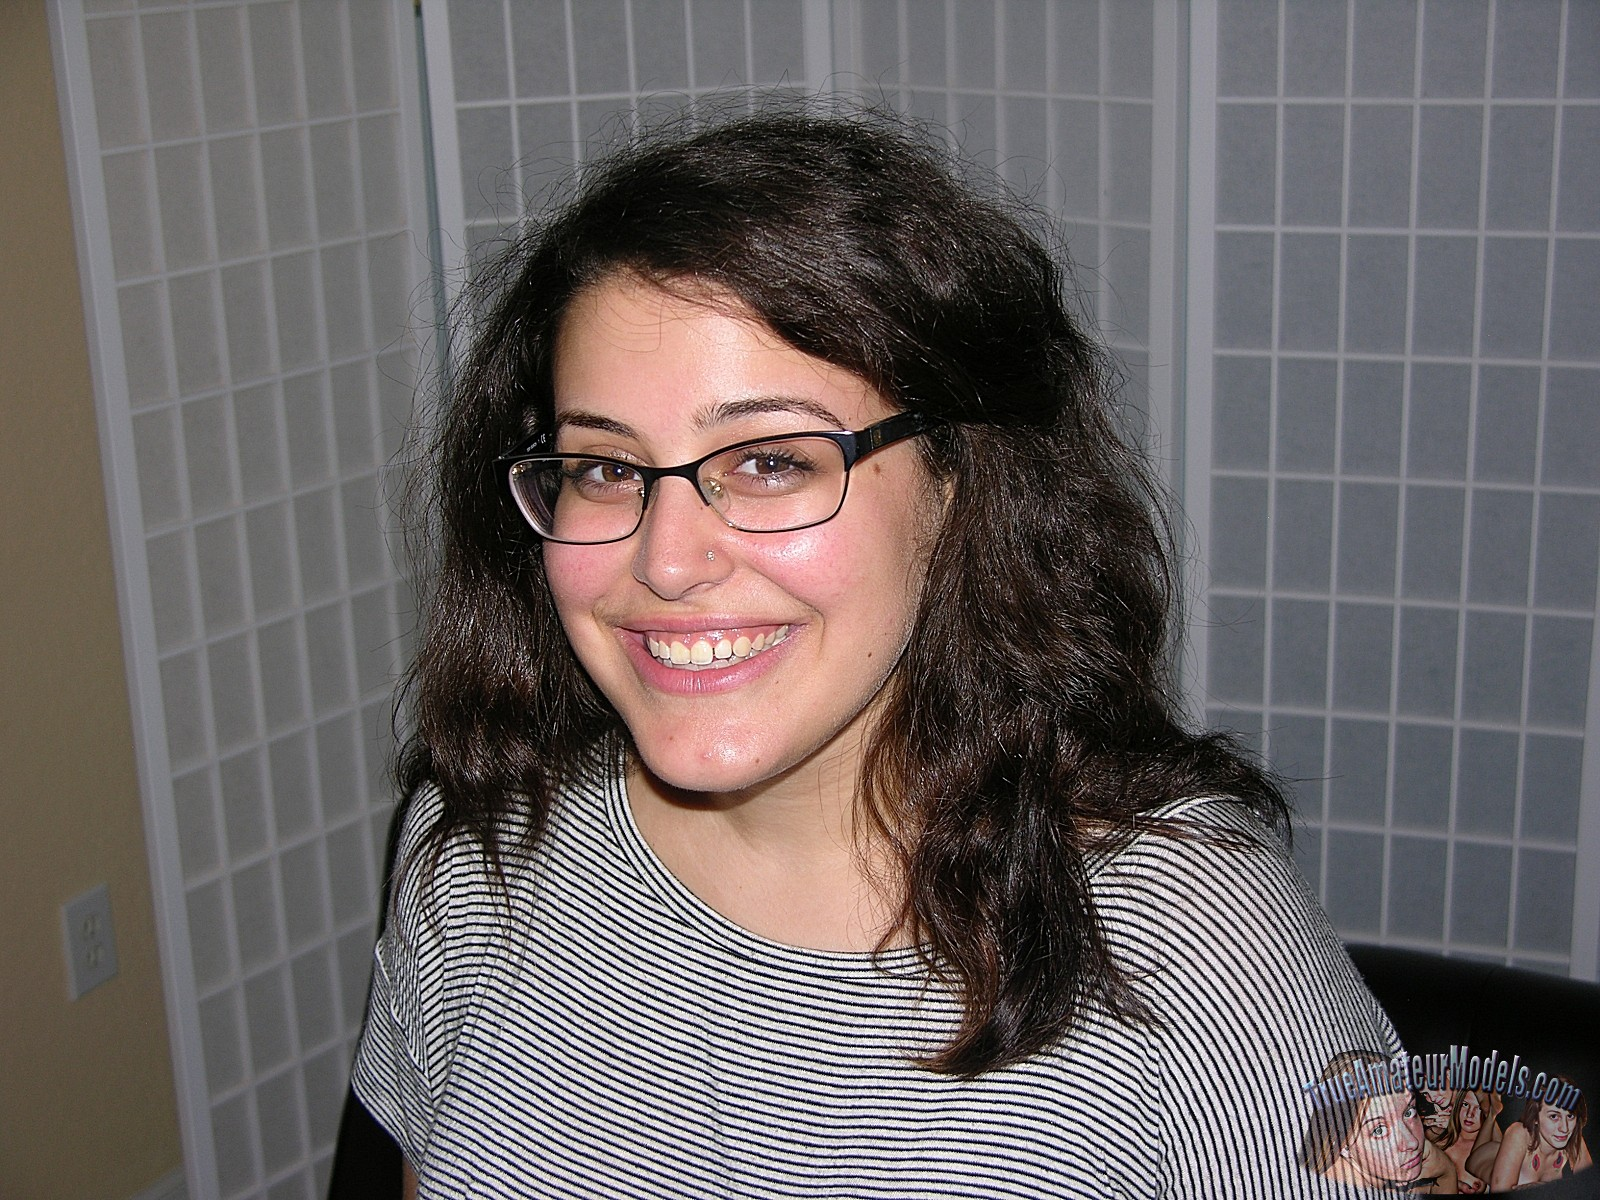 amateur-girl-bella-d-glasses0true-amateur-models1